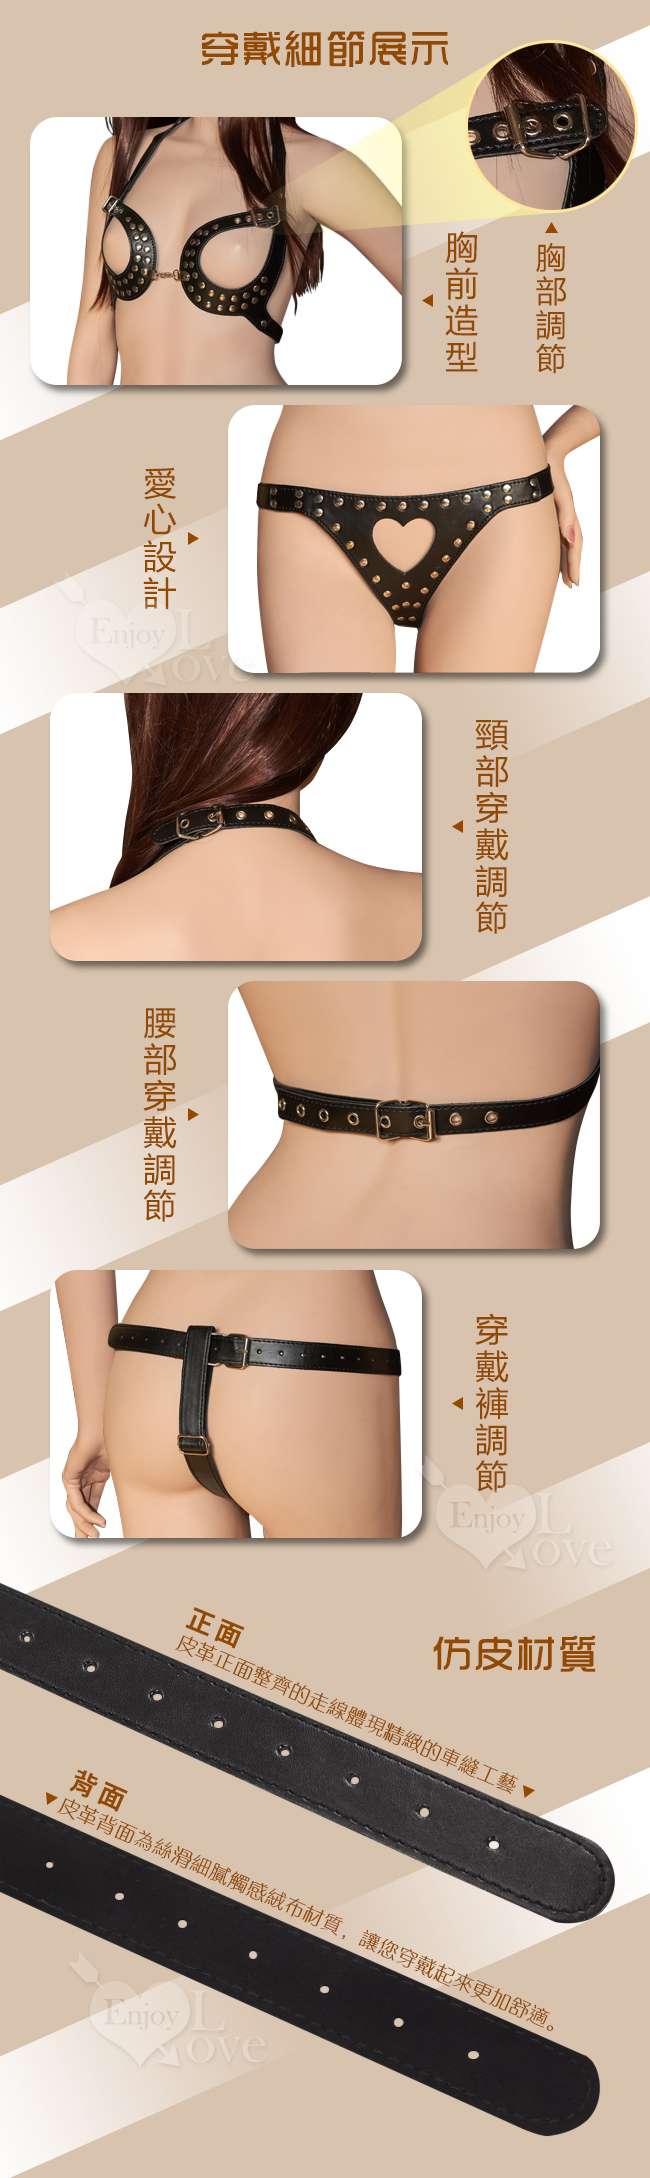 SM 激性裝扮‧皮革塑胸露乳露毛 帶鉚釘心形束縛 -女王扮演者道具衣